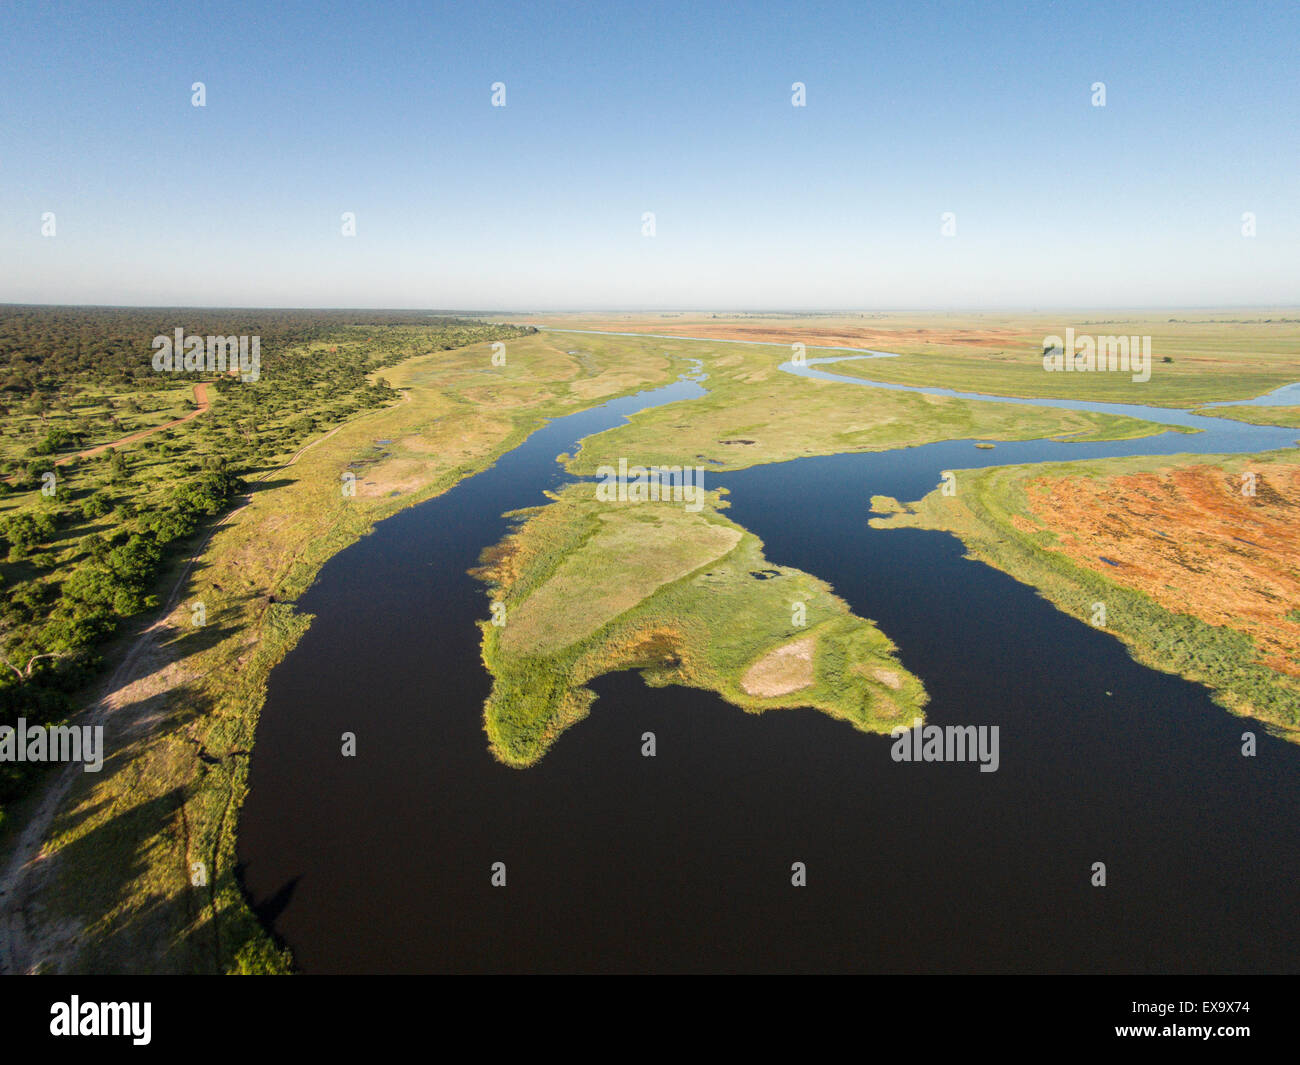 Africa, Botswana, Chobe National Park, Aerial view of Chobe River in Okavango Delta near Ihaha Camp - Stock Image